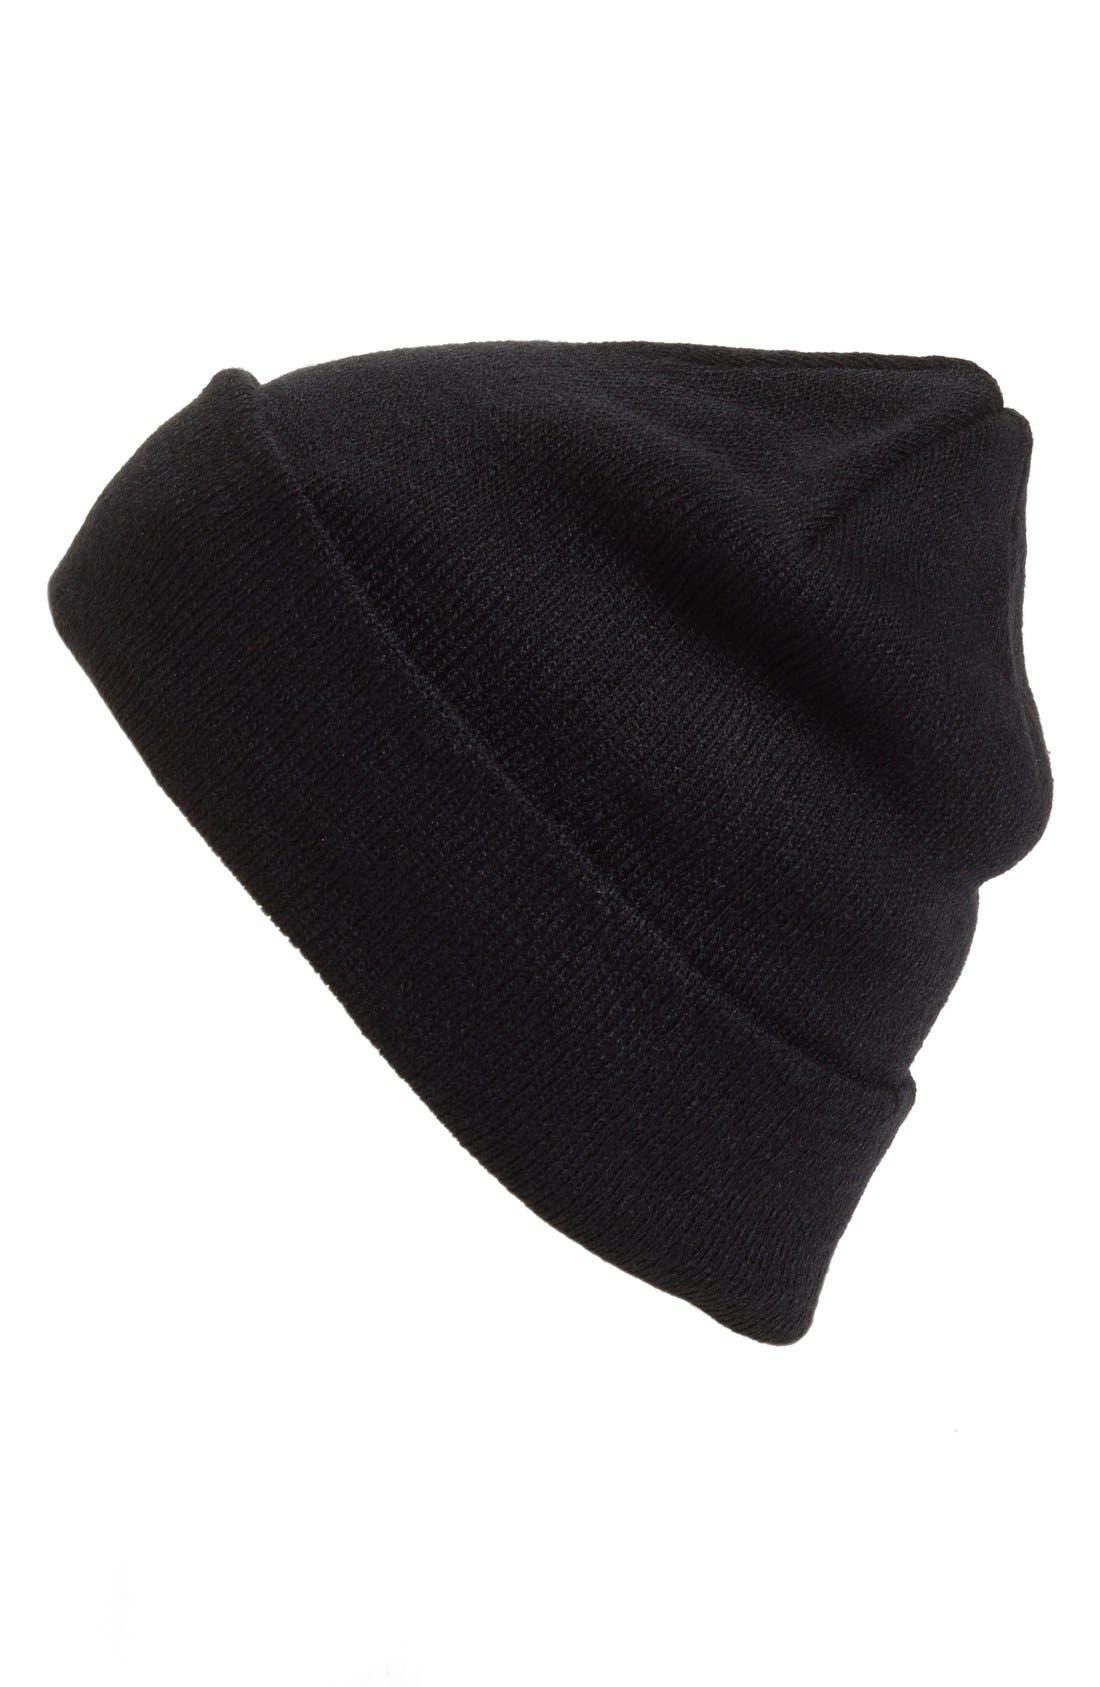 Alternate Image 1 Selected - BP. Knit Beanie